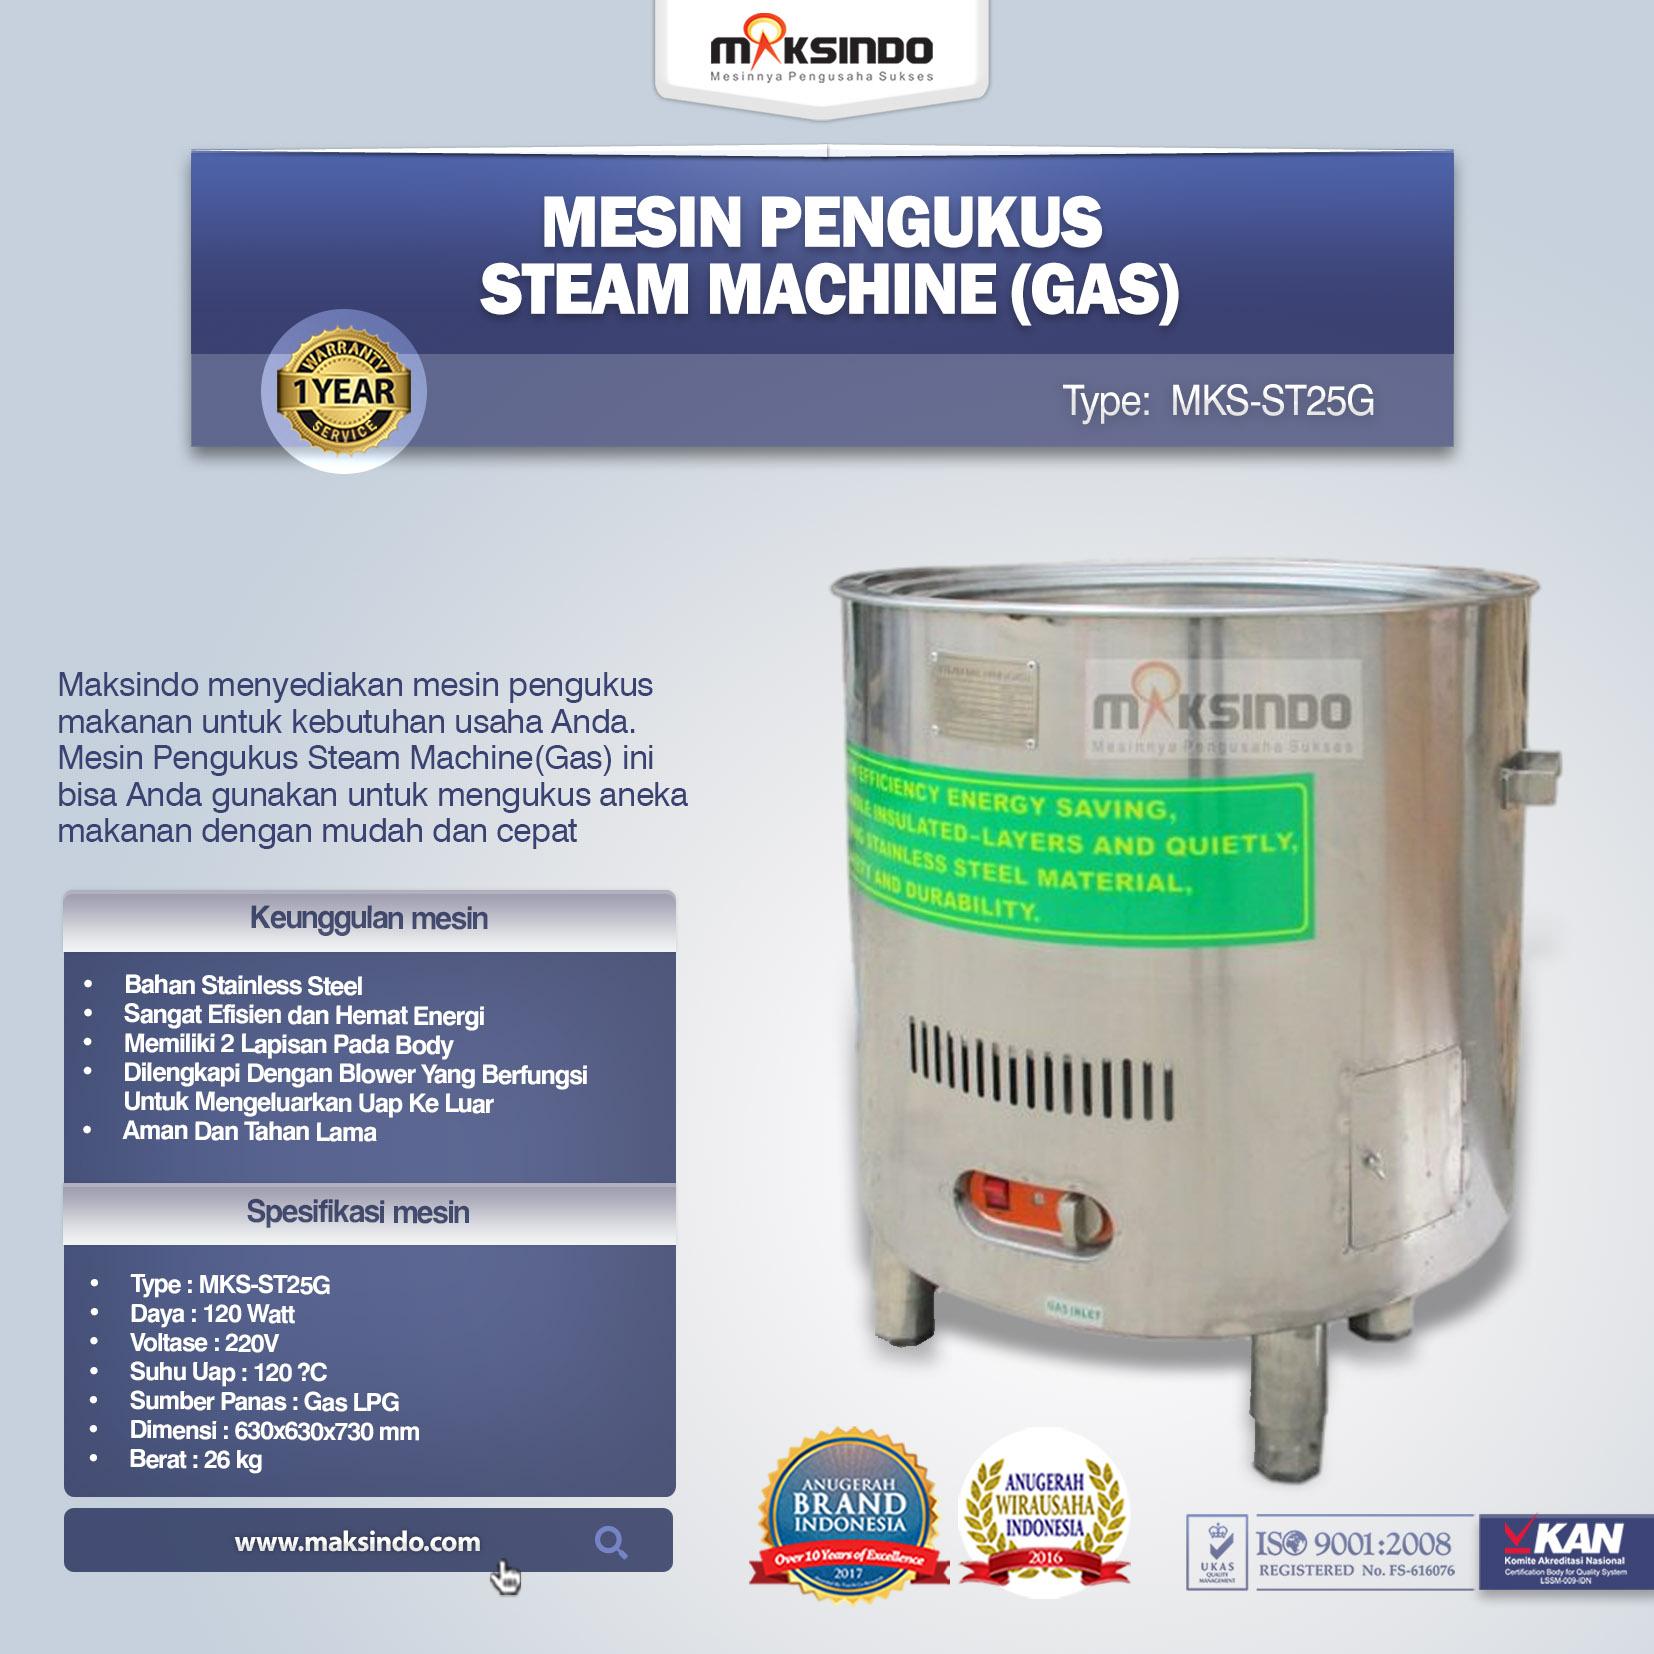 Mesin Pengukus Steam Machine (Gas) MKS-ST25G